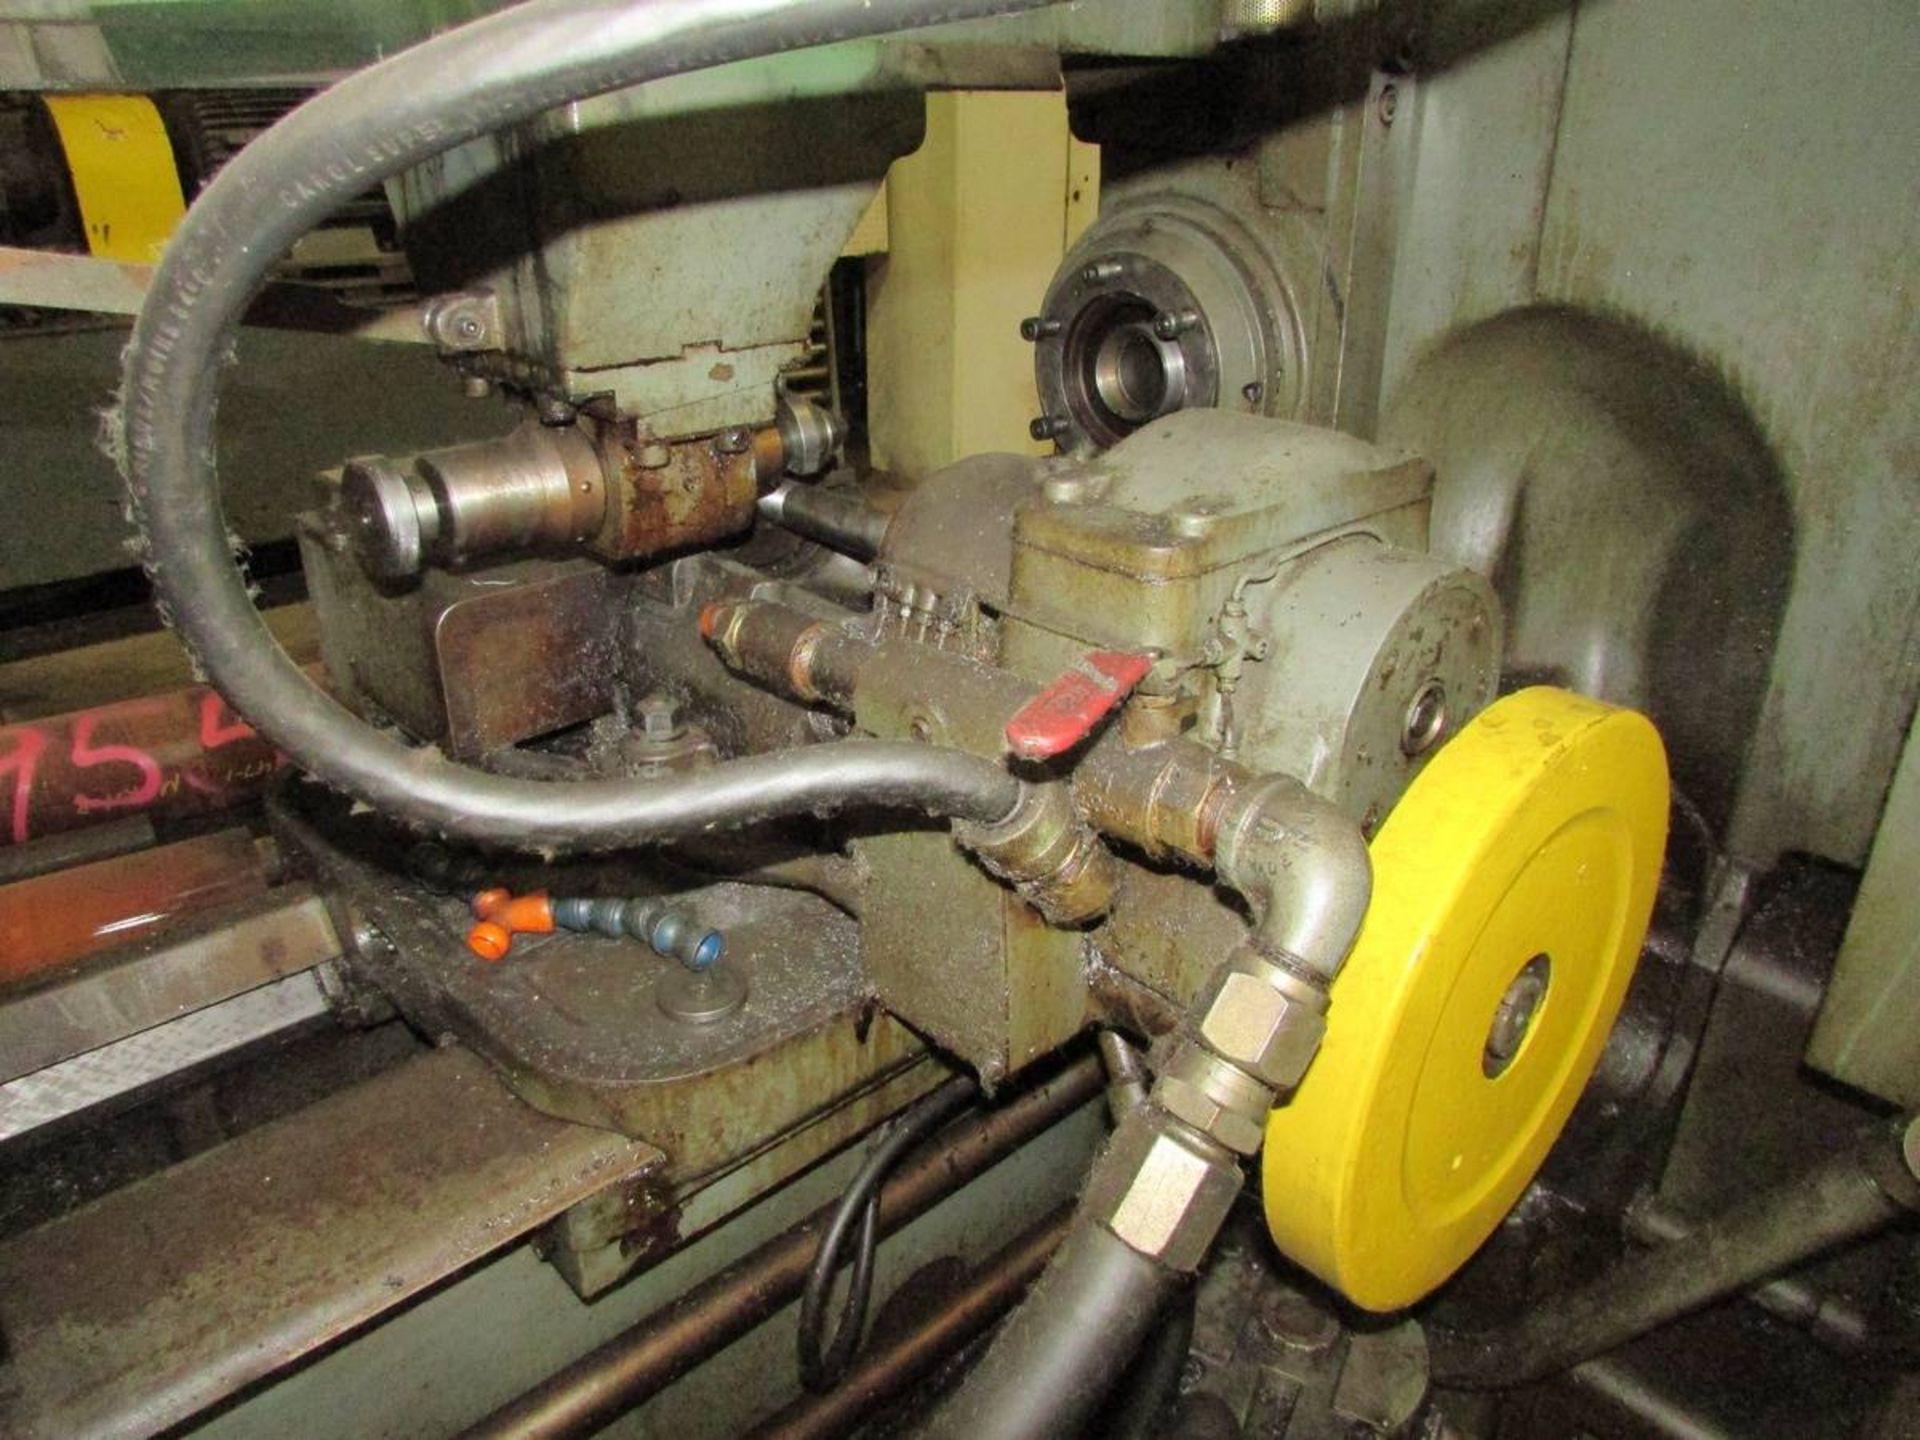 Barber Colman 16-16 Gear Hobbing Machine - Image 15 of 24